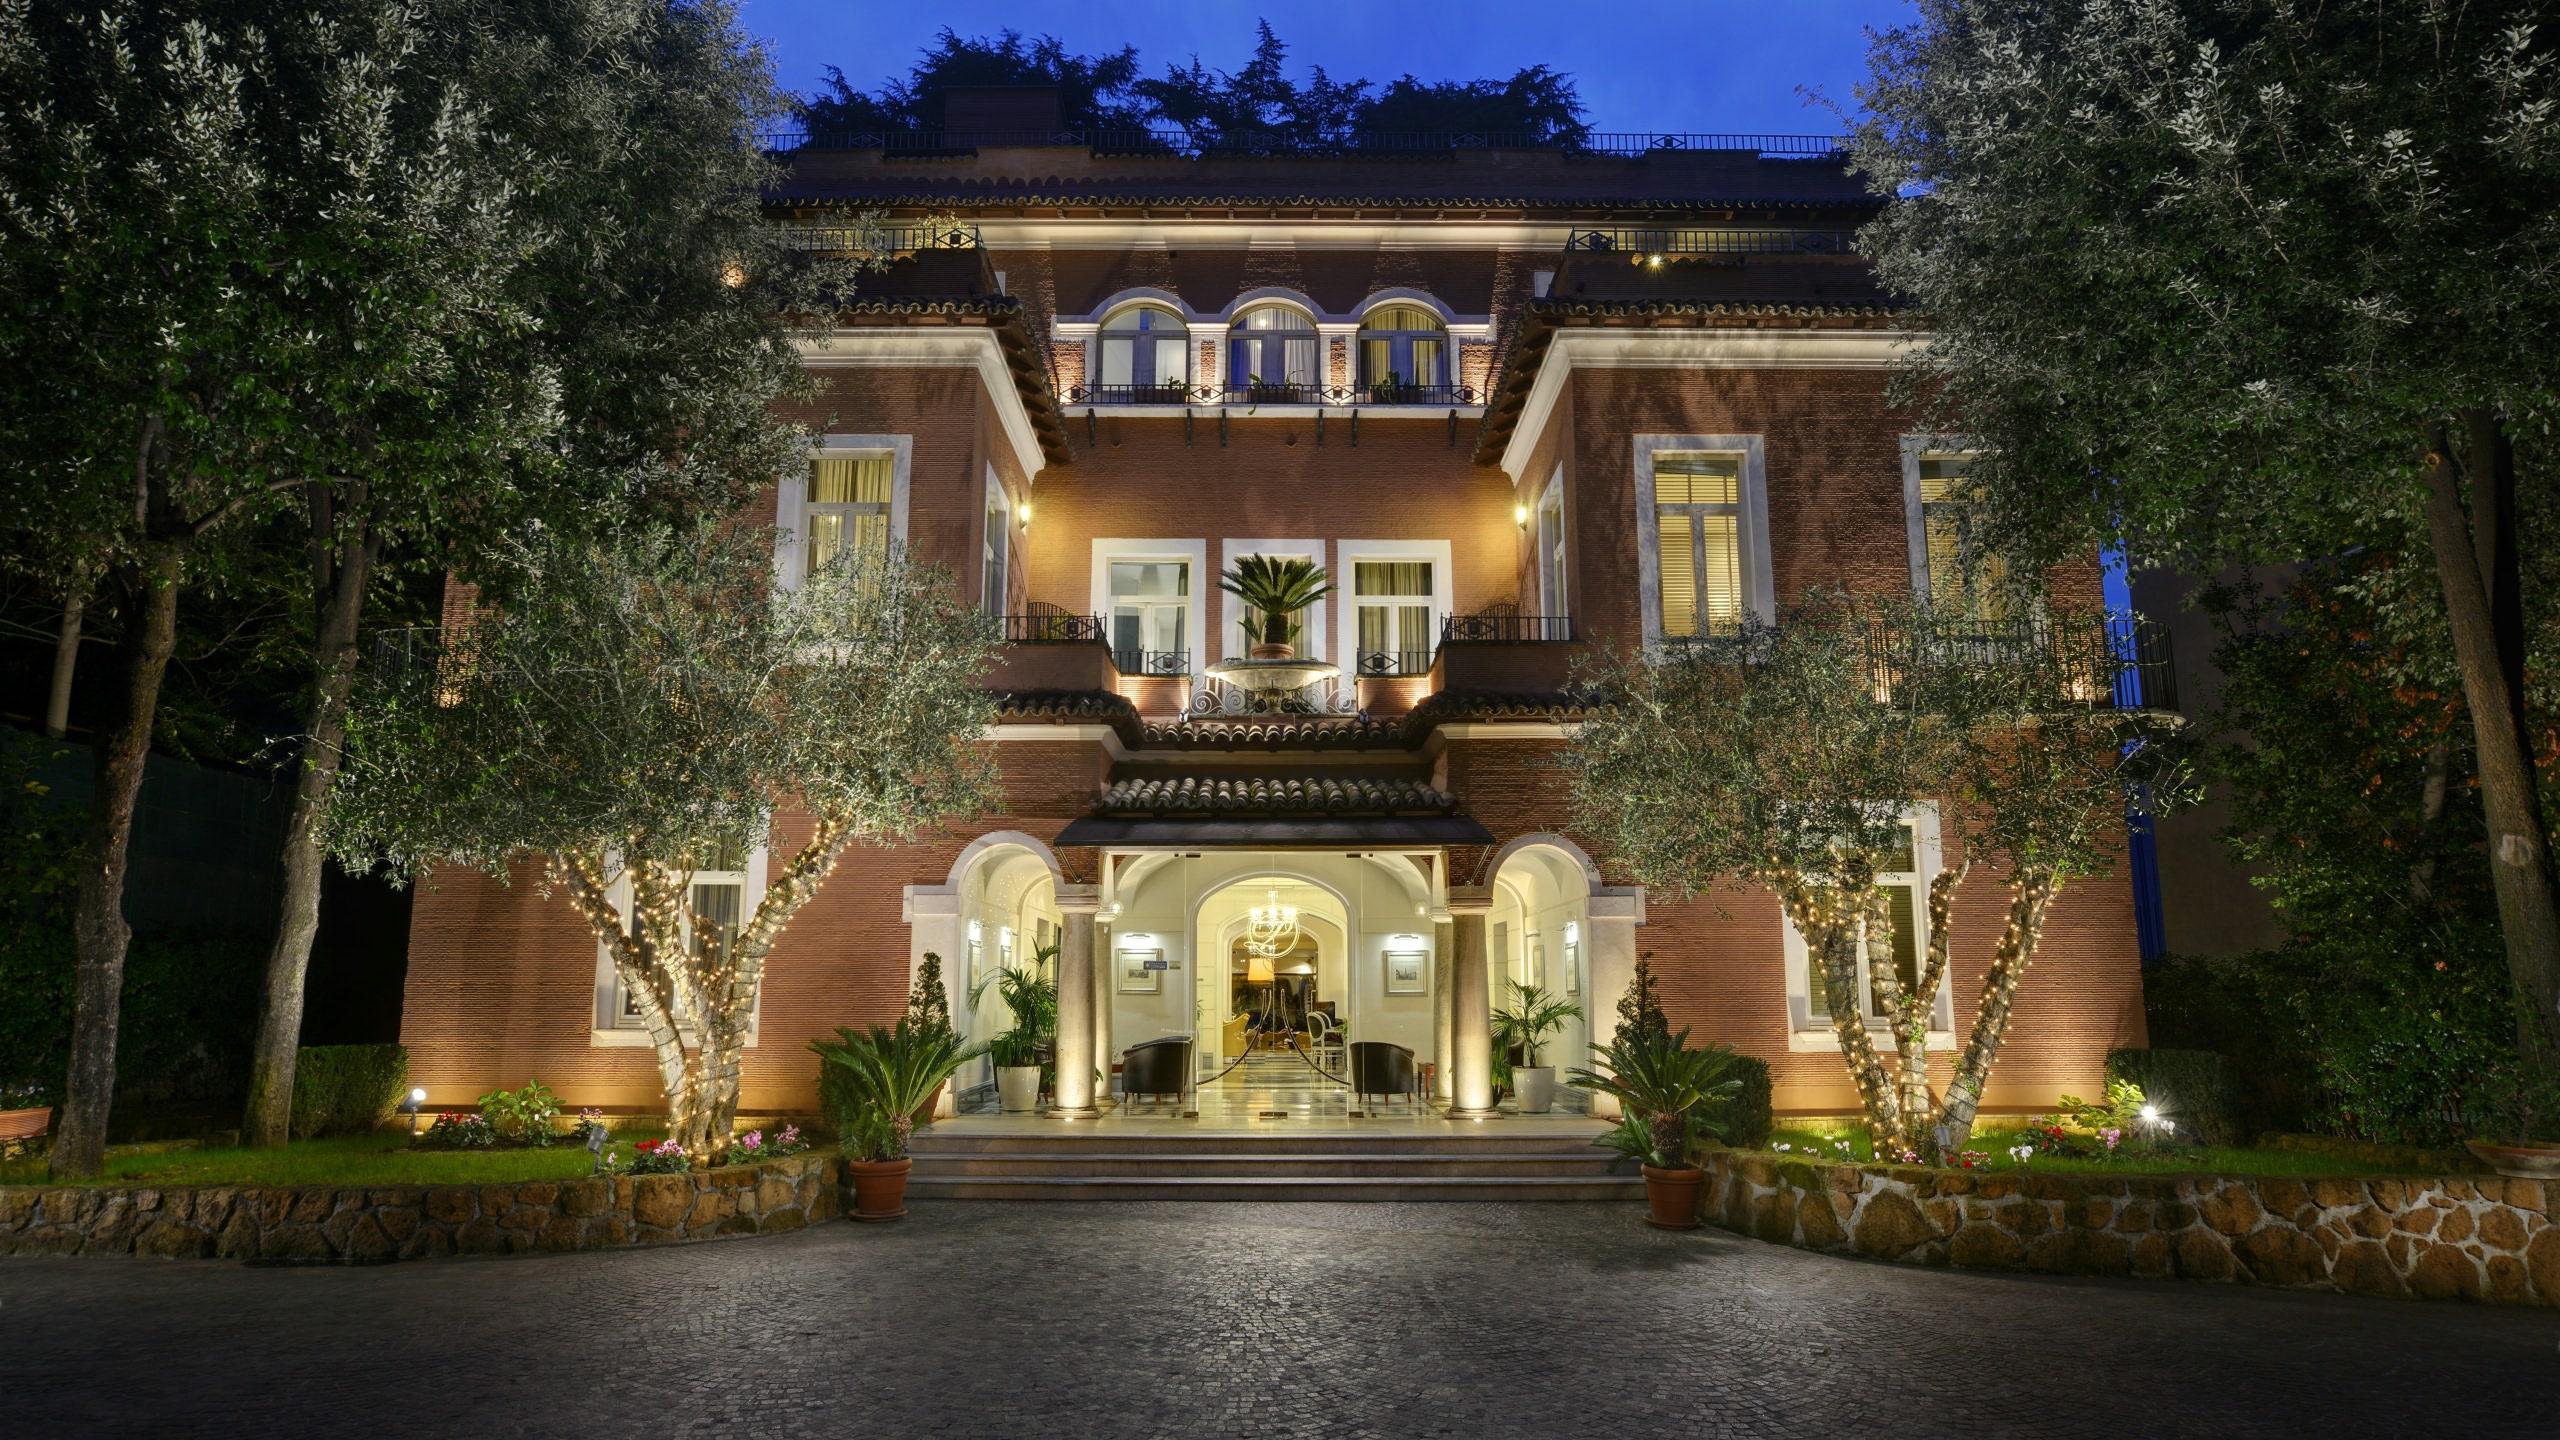 hotel-principe-torlonia-extern-01